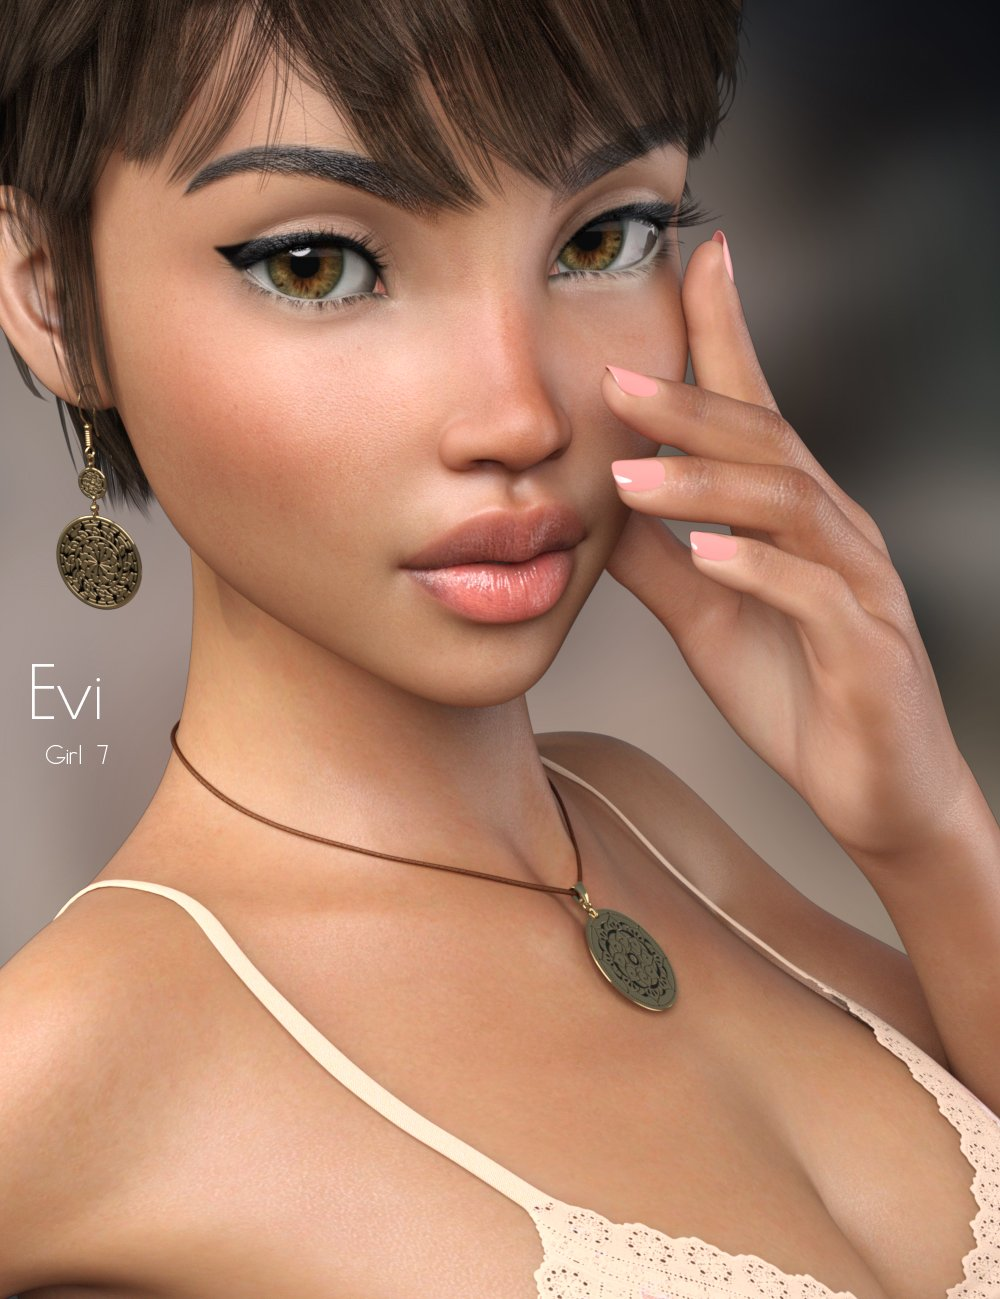 P3D Evi for Girl 7 by: P3Design, 3D Models by Daz 3D